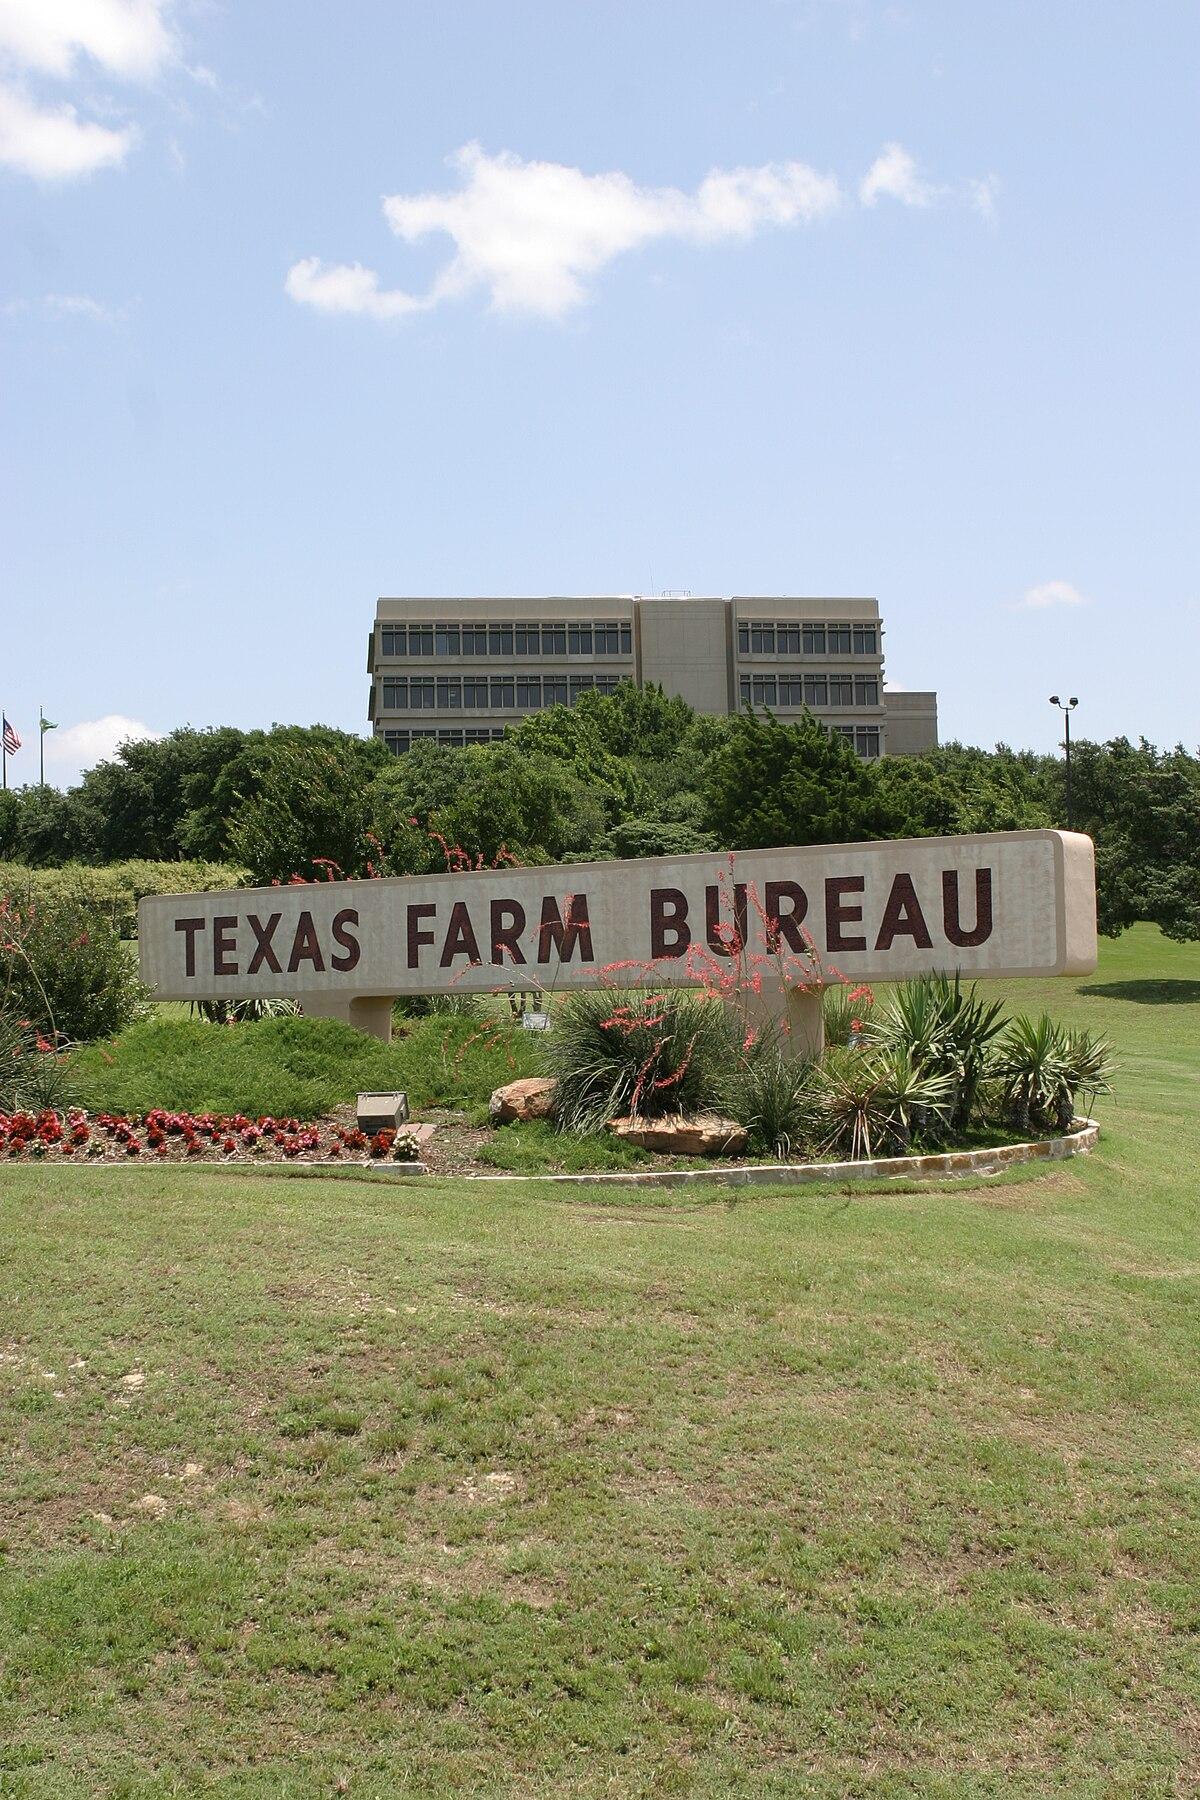 Agricultural lease rates decline in Texas - Texas Farm Bureau |Texas Agriculture